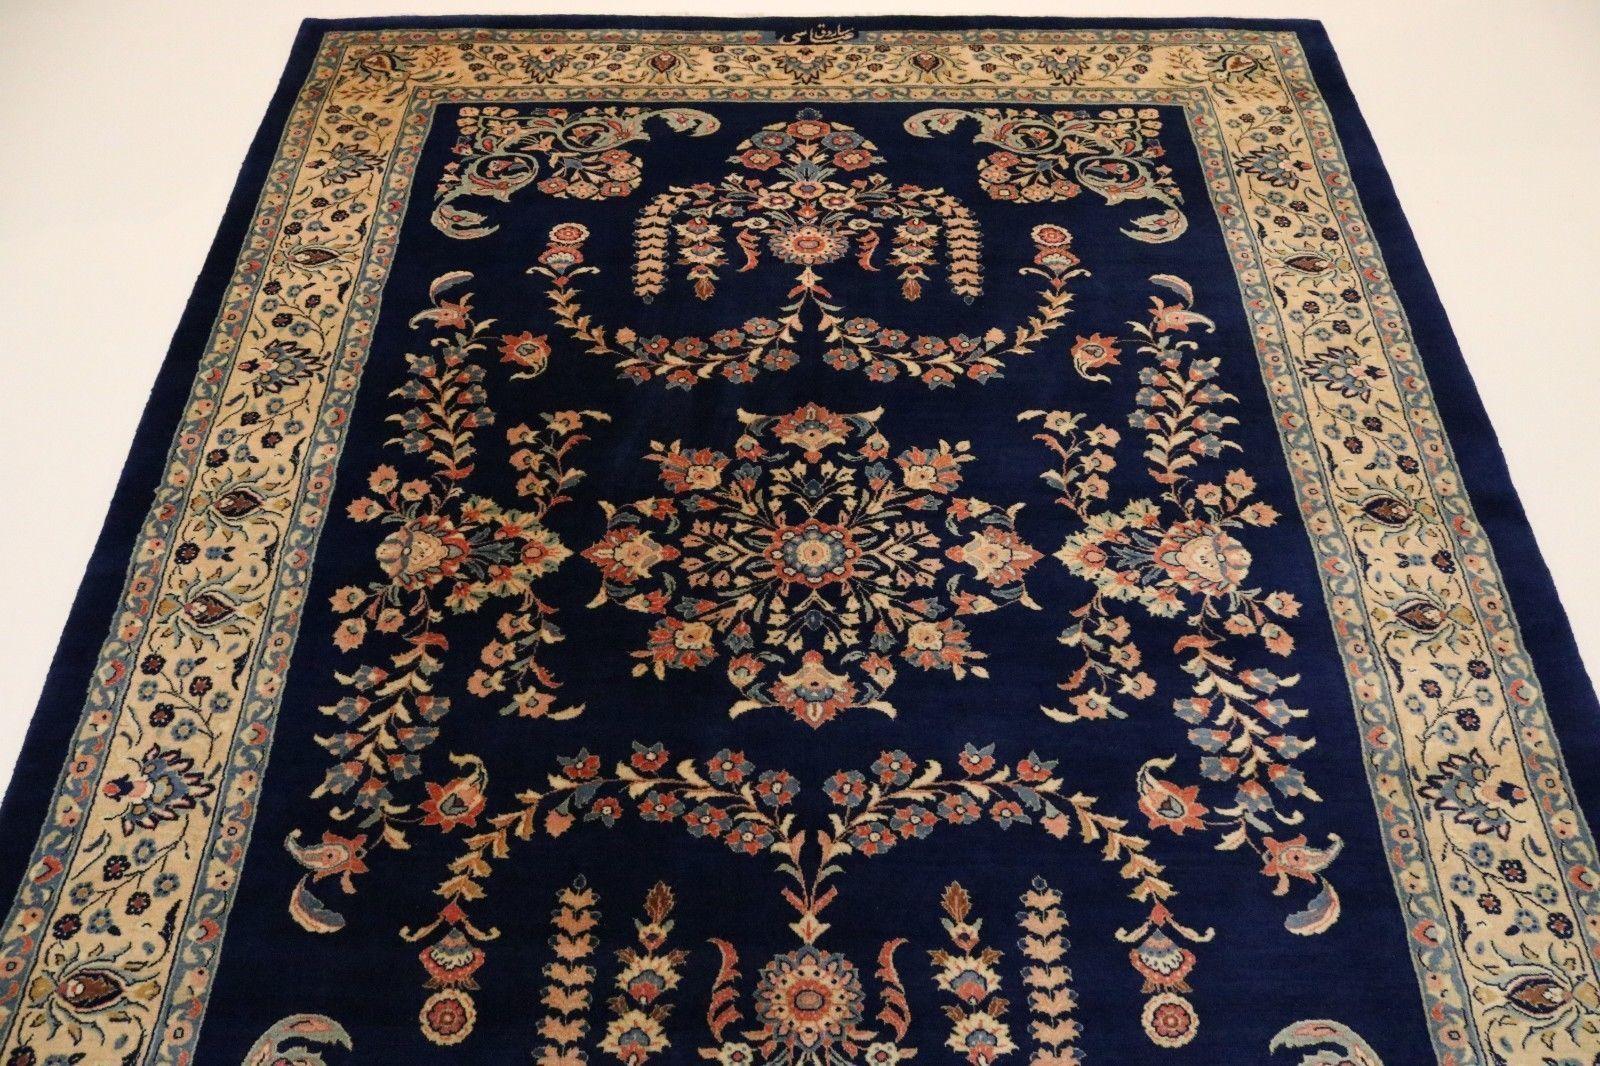 Sherkat Sarougi Signed Fine Persian Rug Oriental Rug 2 69 X 2 00 Vinterior Co